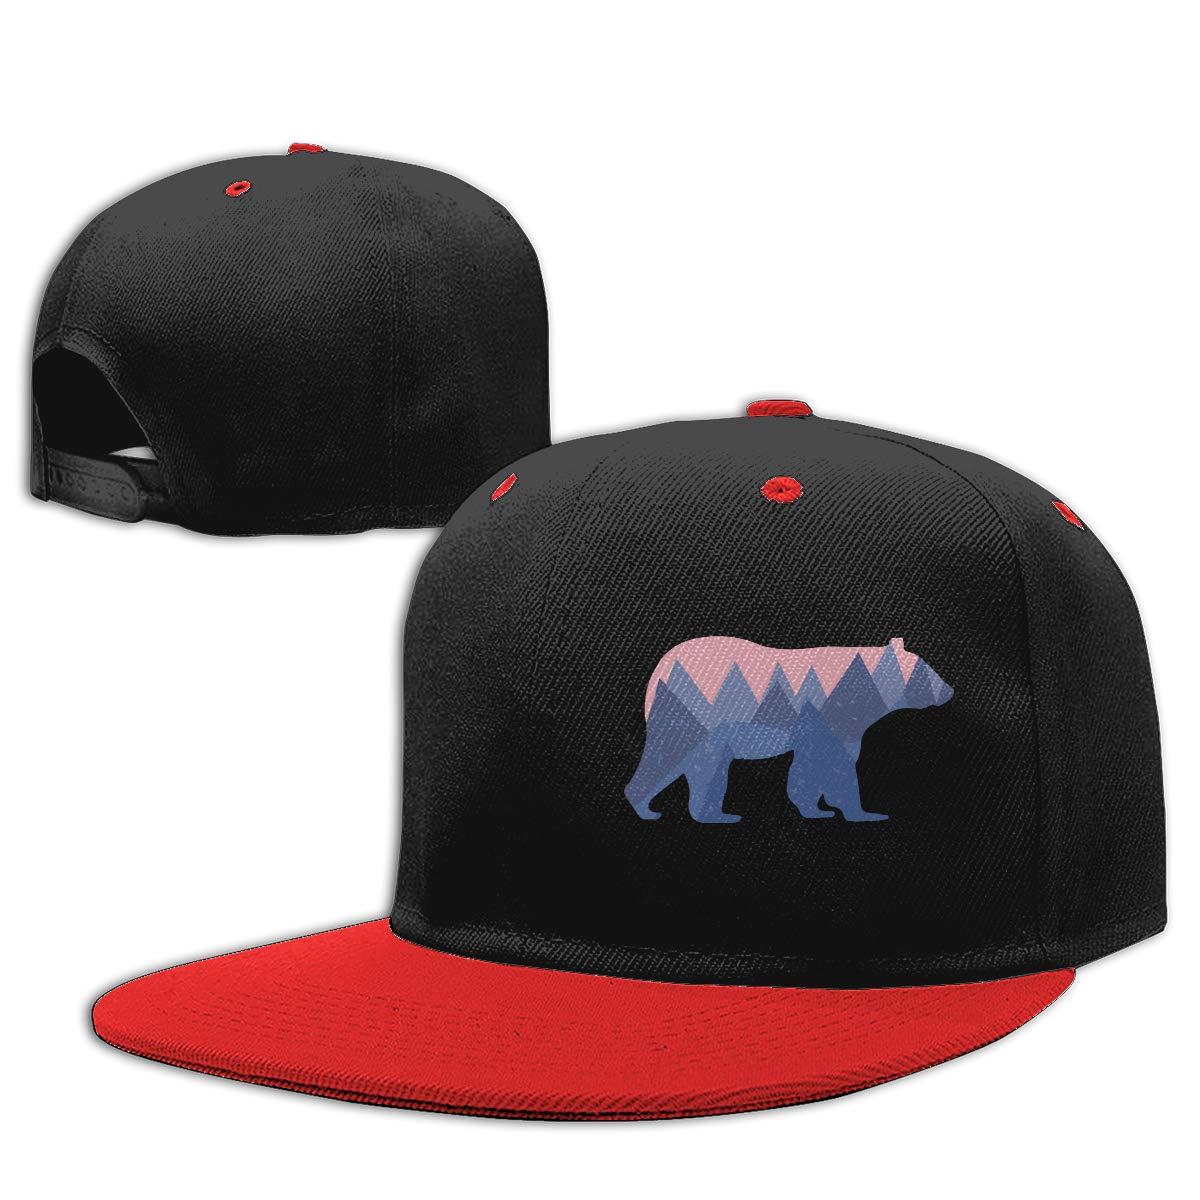 Bear Mountain Adults Flat Bill Baseball Caps NMG-01 Women Men Trucker Cap